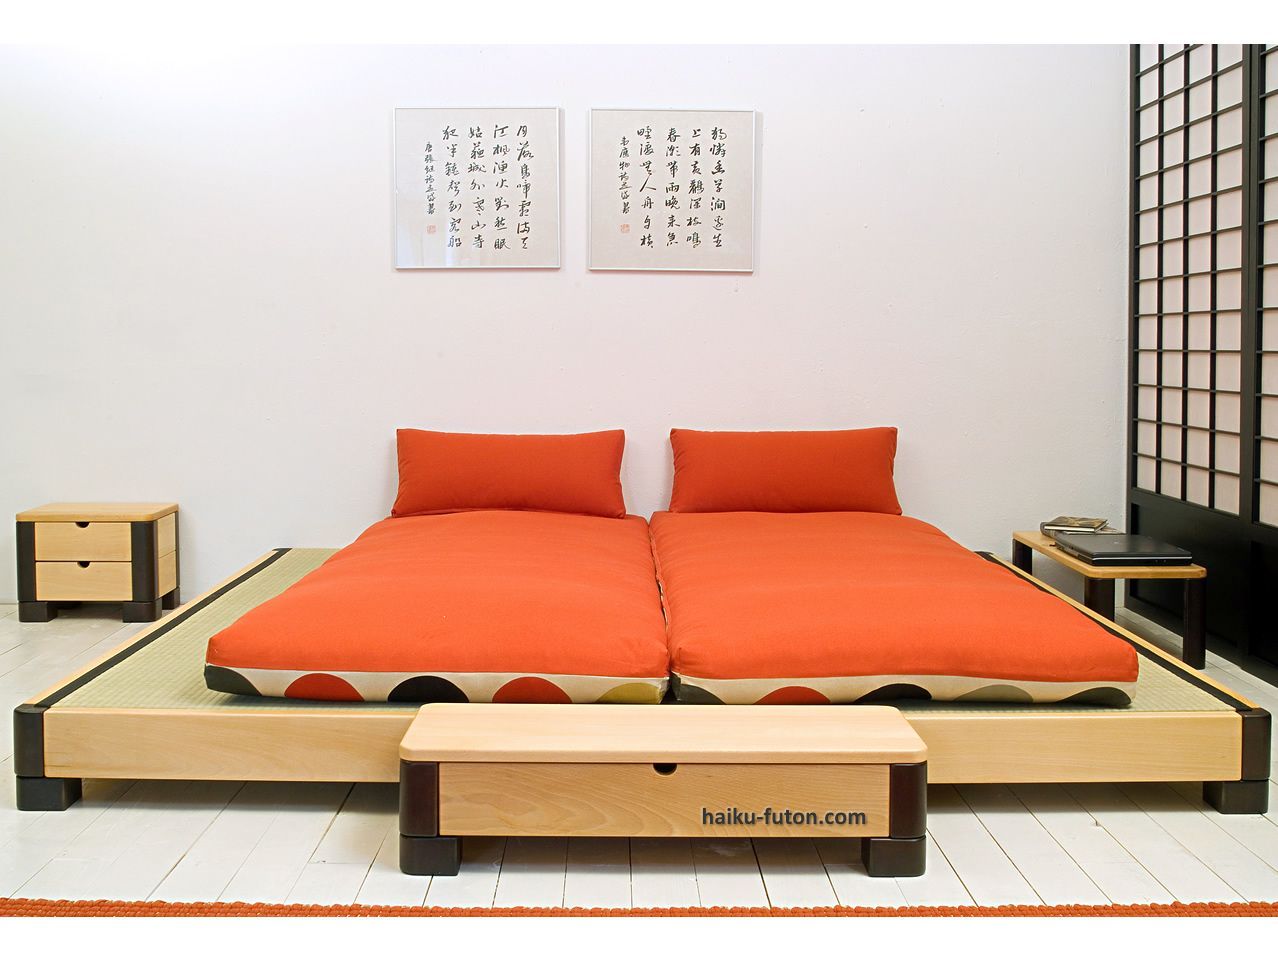 Cama Tatami, Cama japonesa | Habitaciones | Pinterest | Tatami cama ...